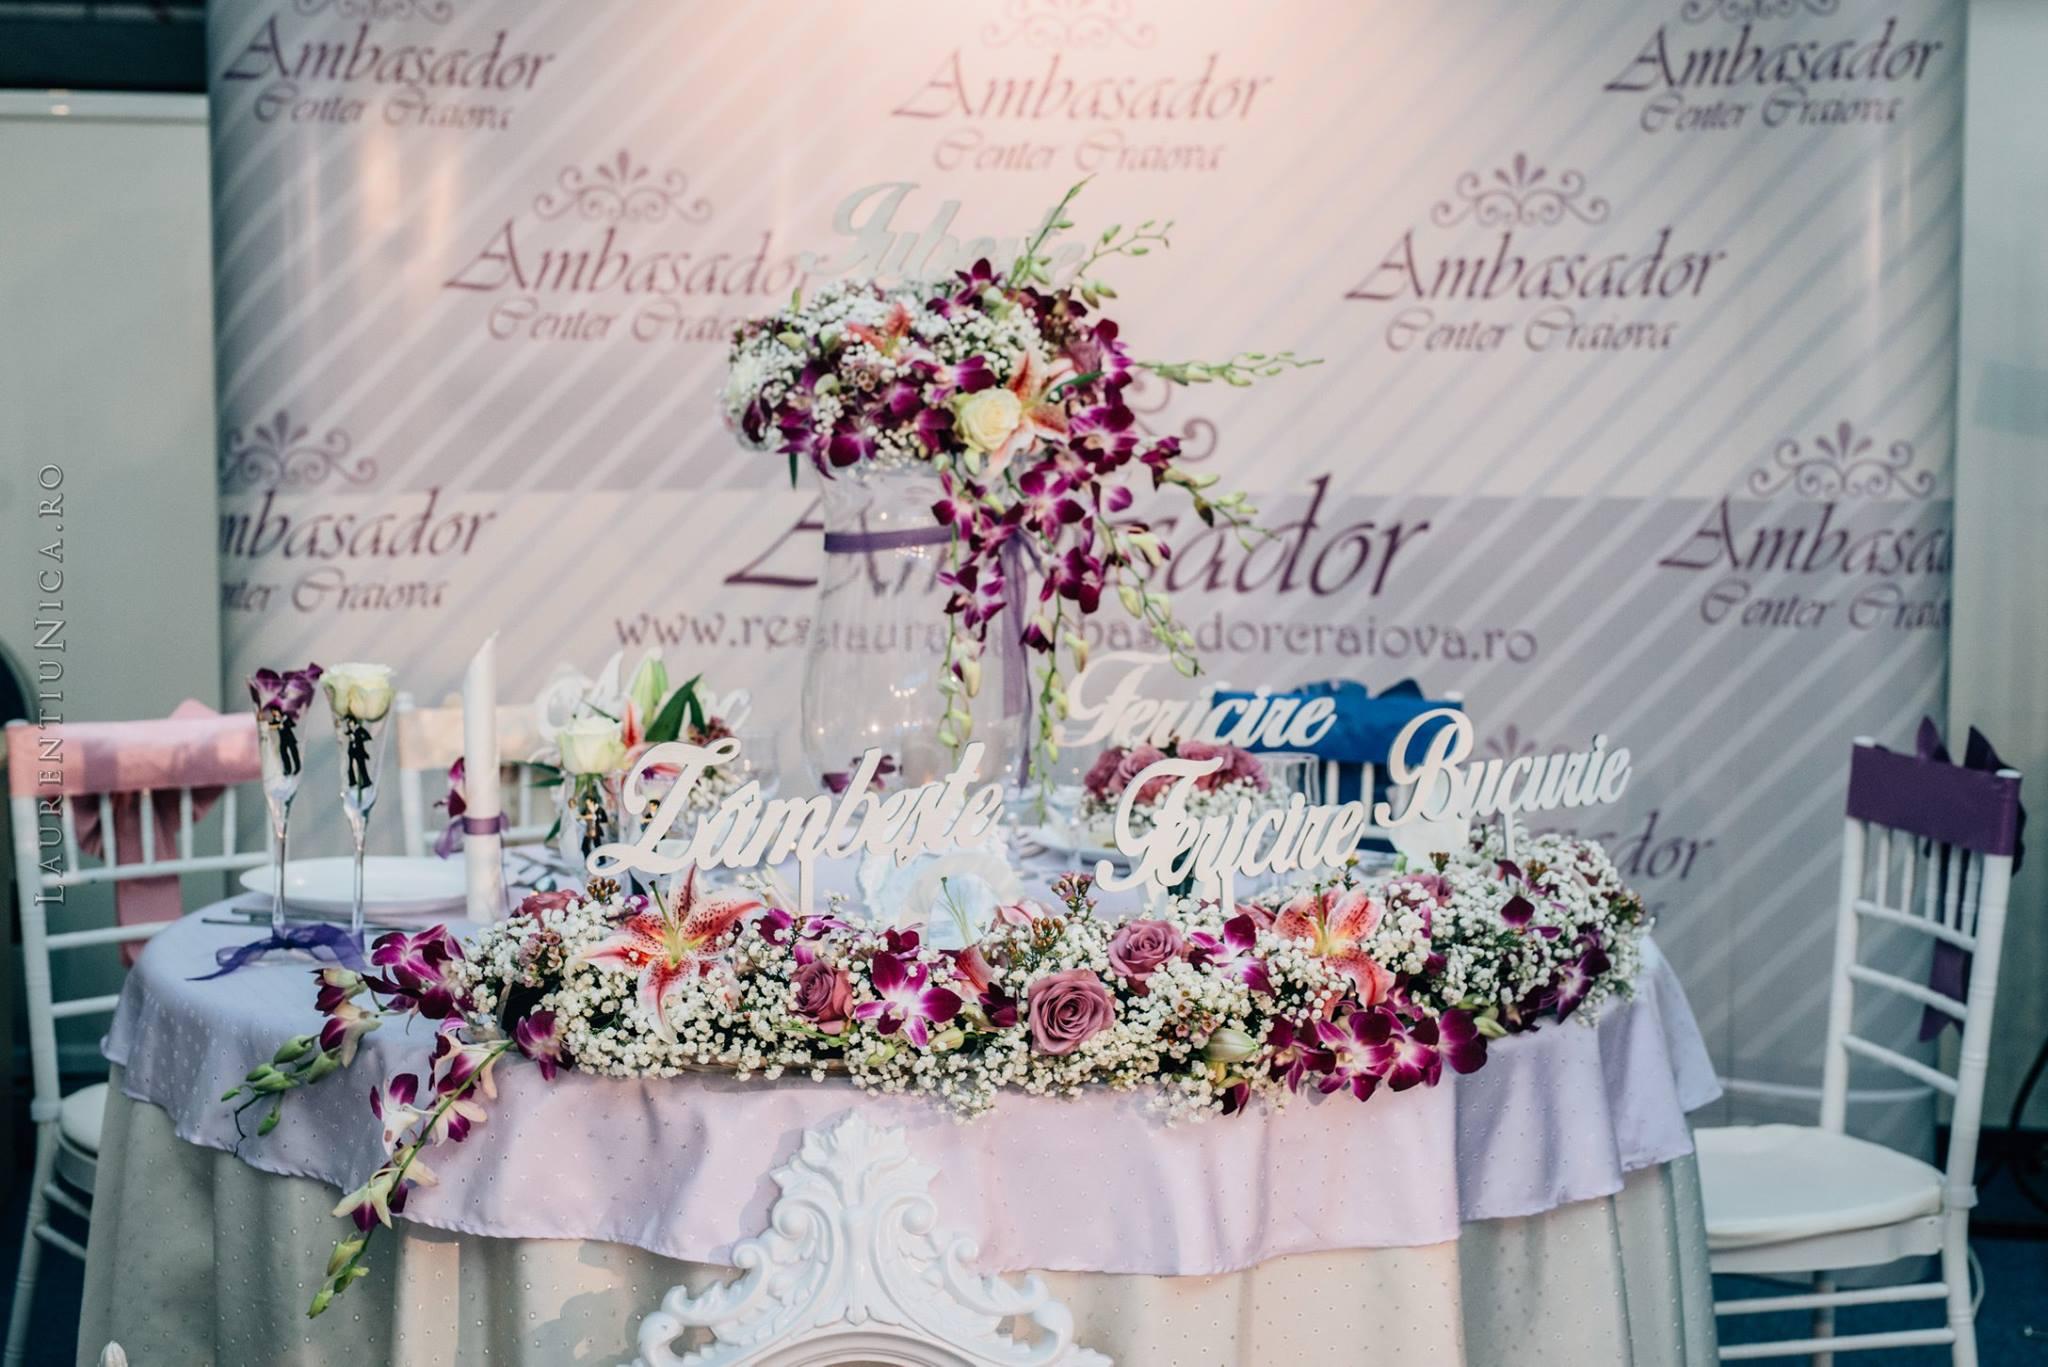 "Targul de nunti ""Wedding Fever"" 2017 Editia a VIII-a Craiova | Restaurant Nunta, Botez, Corporate, Evenimente Craiova | Ambasador Center Craiova"